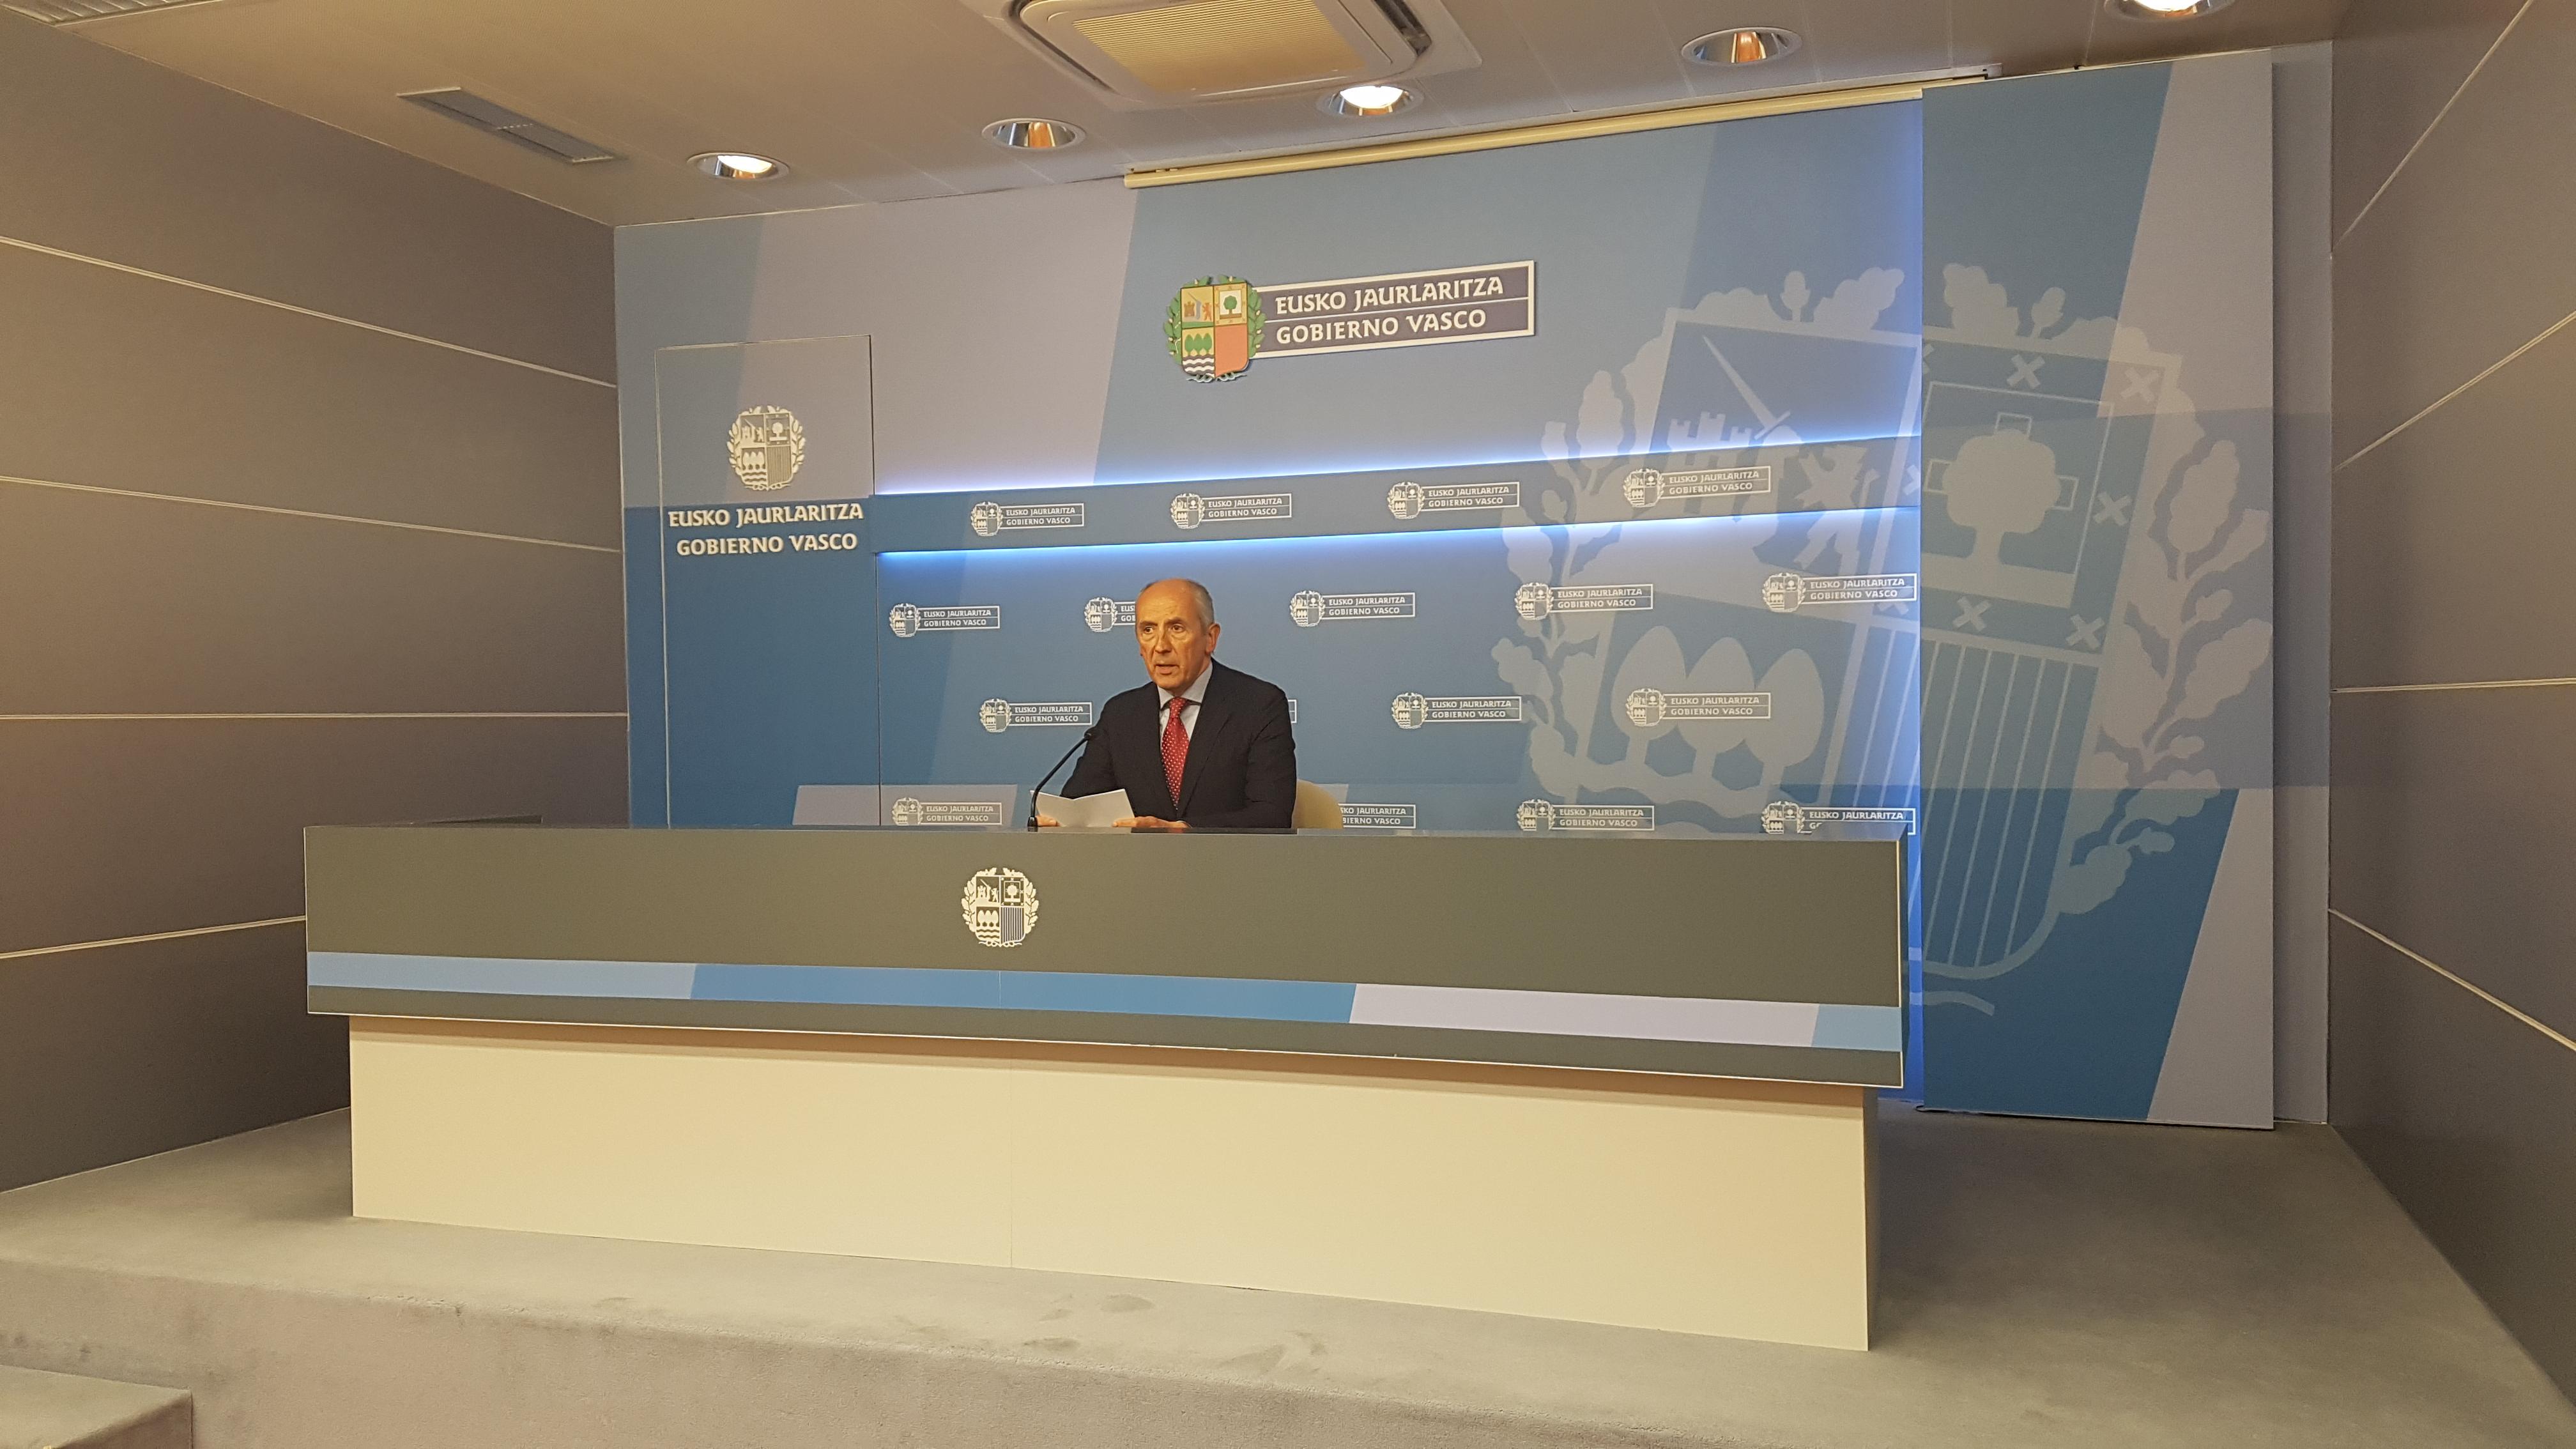 Gobierno vasco y español acuerdan el traspaso de la AP-68 a Euskadi